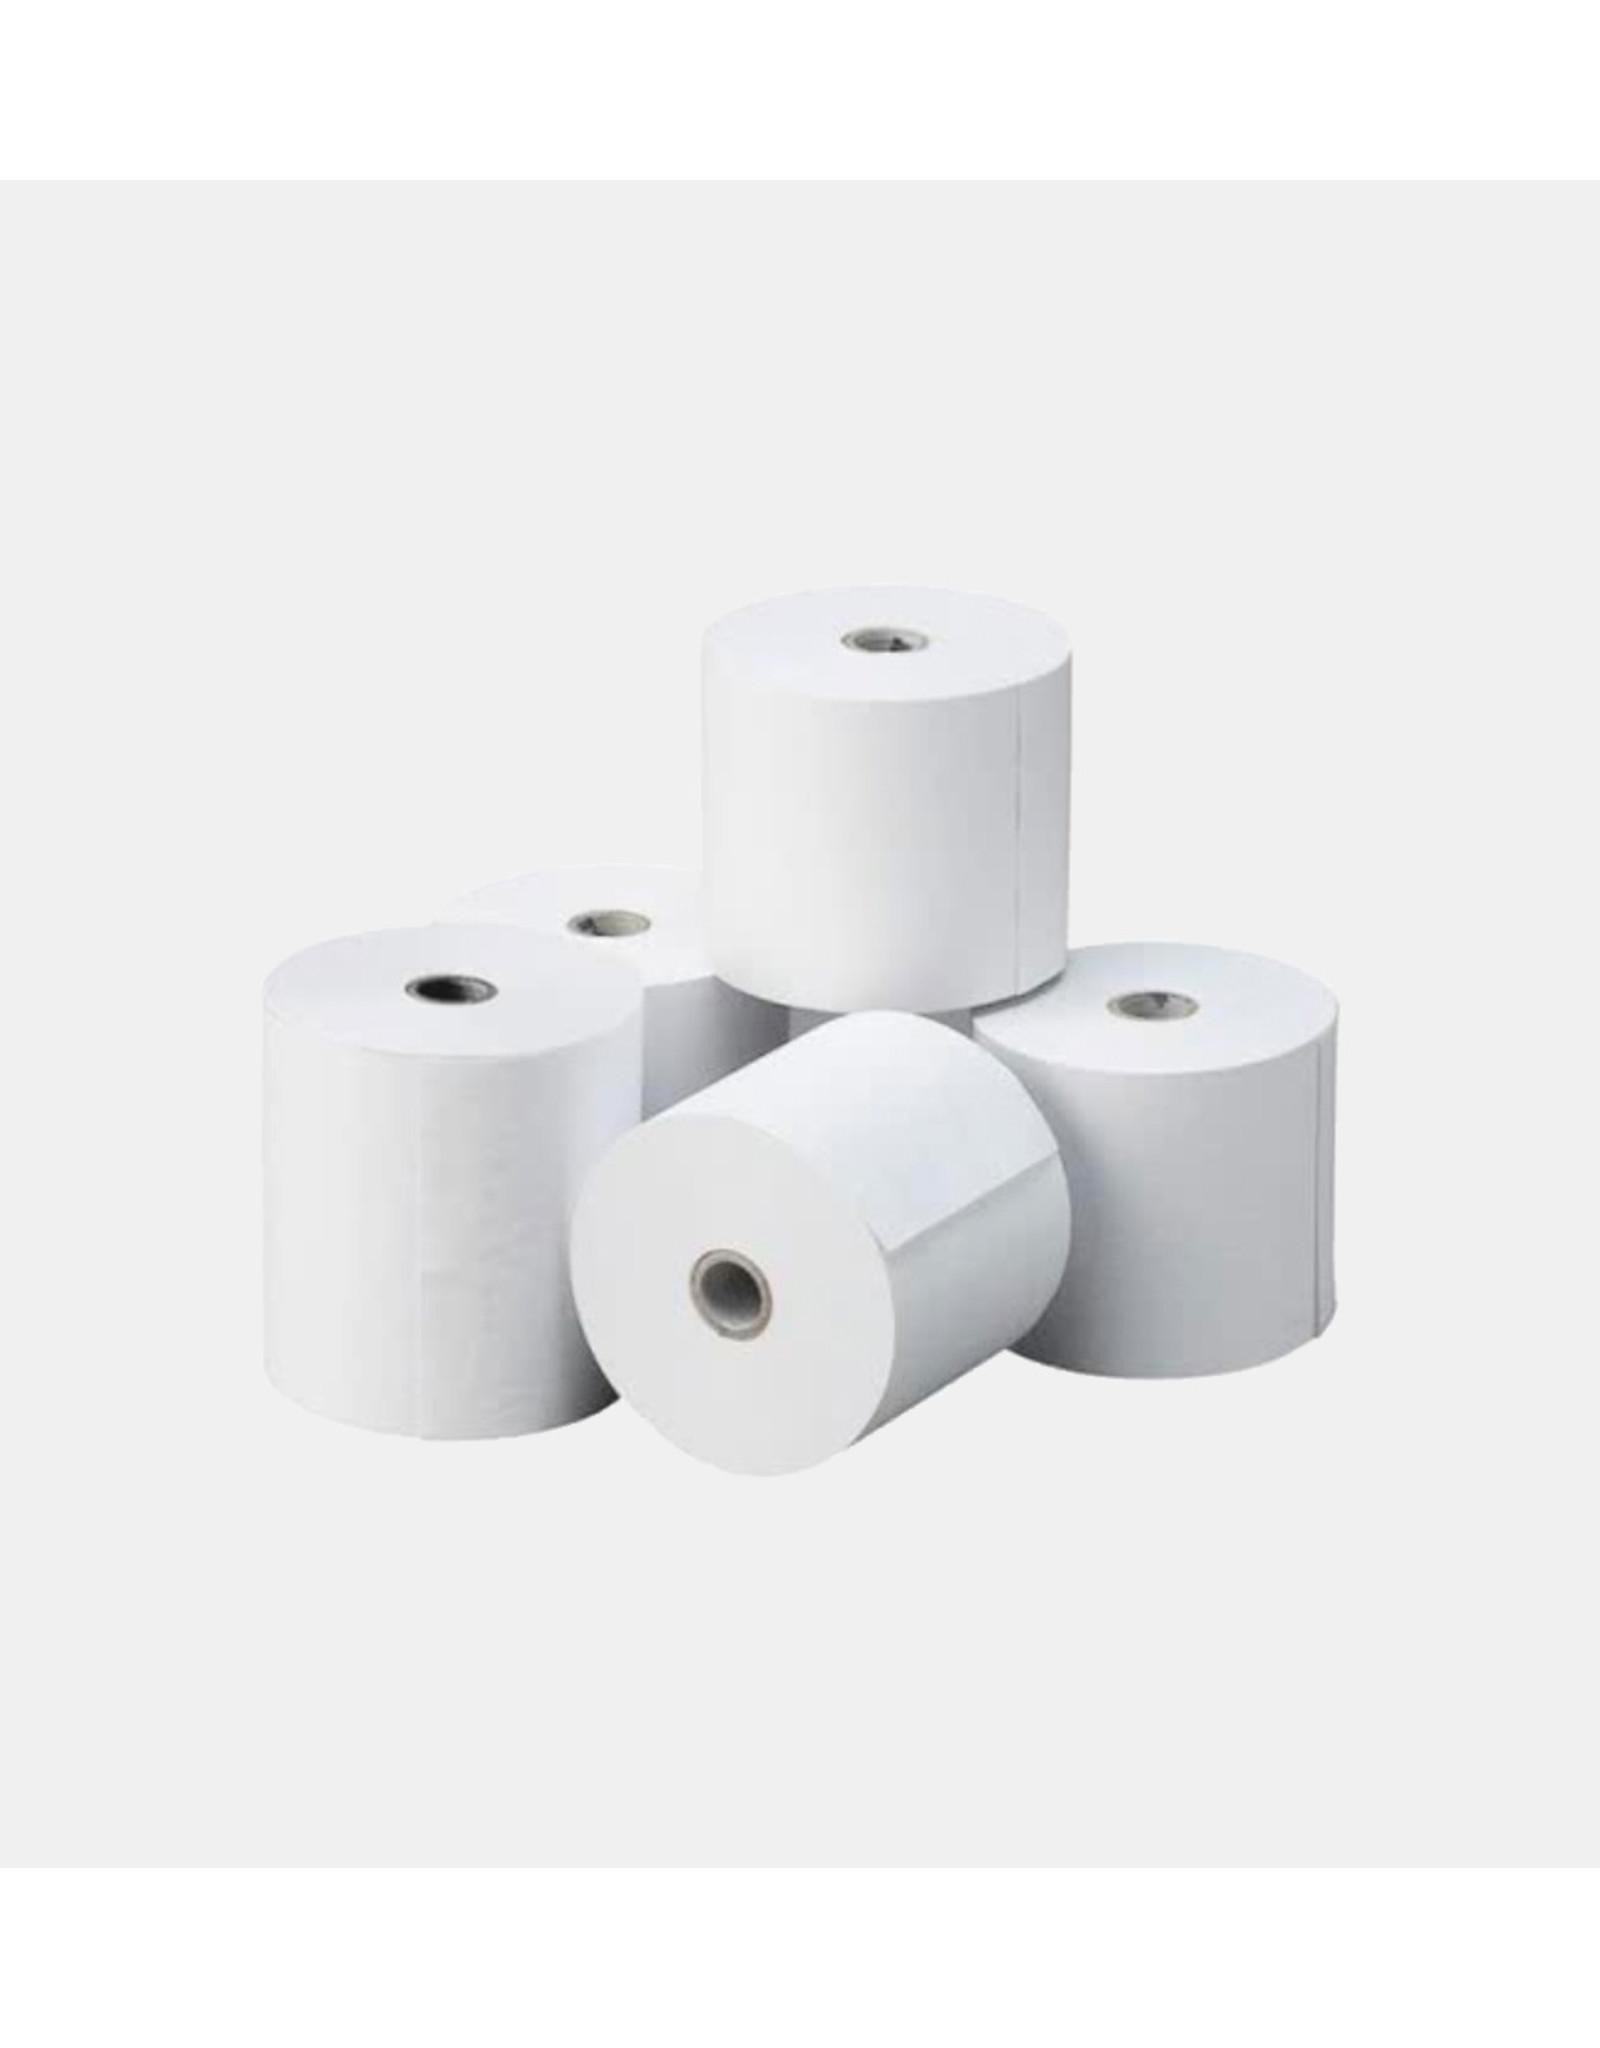 Calibor Box of Thermal Receipt Paper - 24 Pack